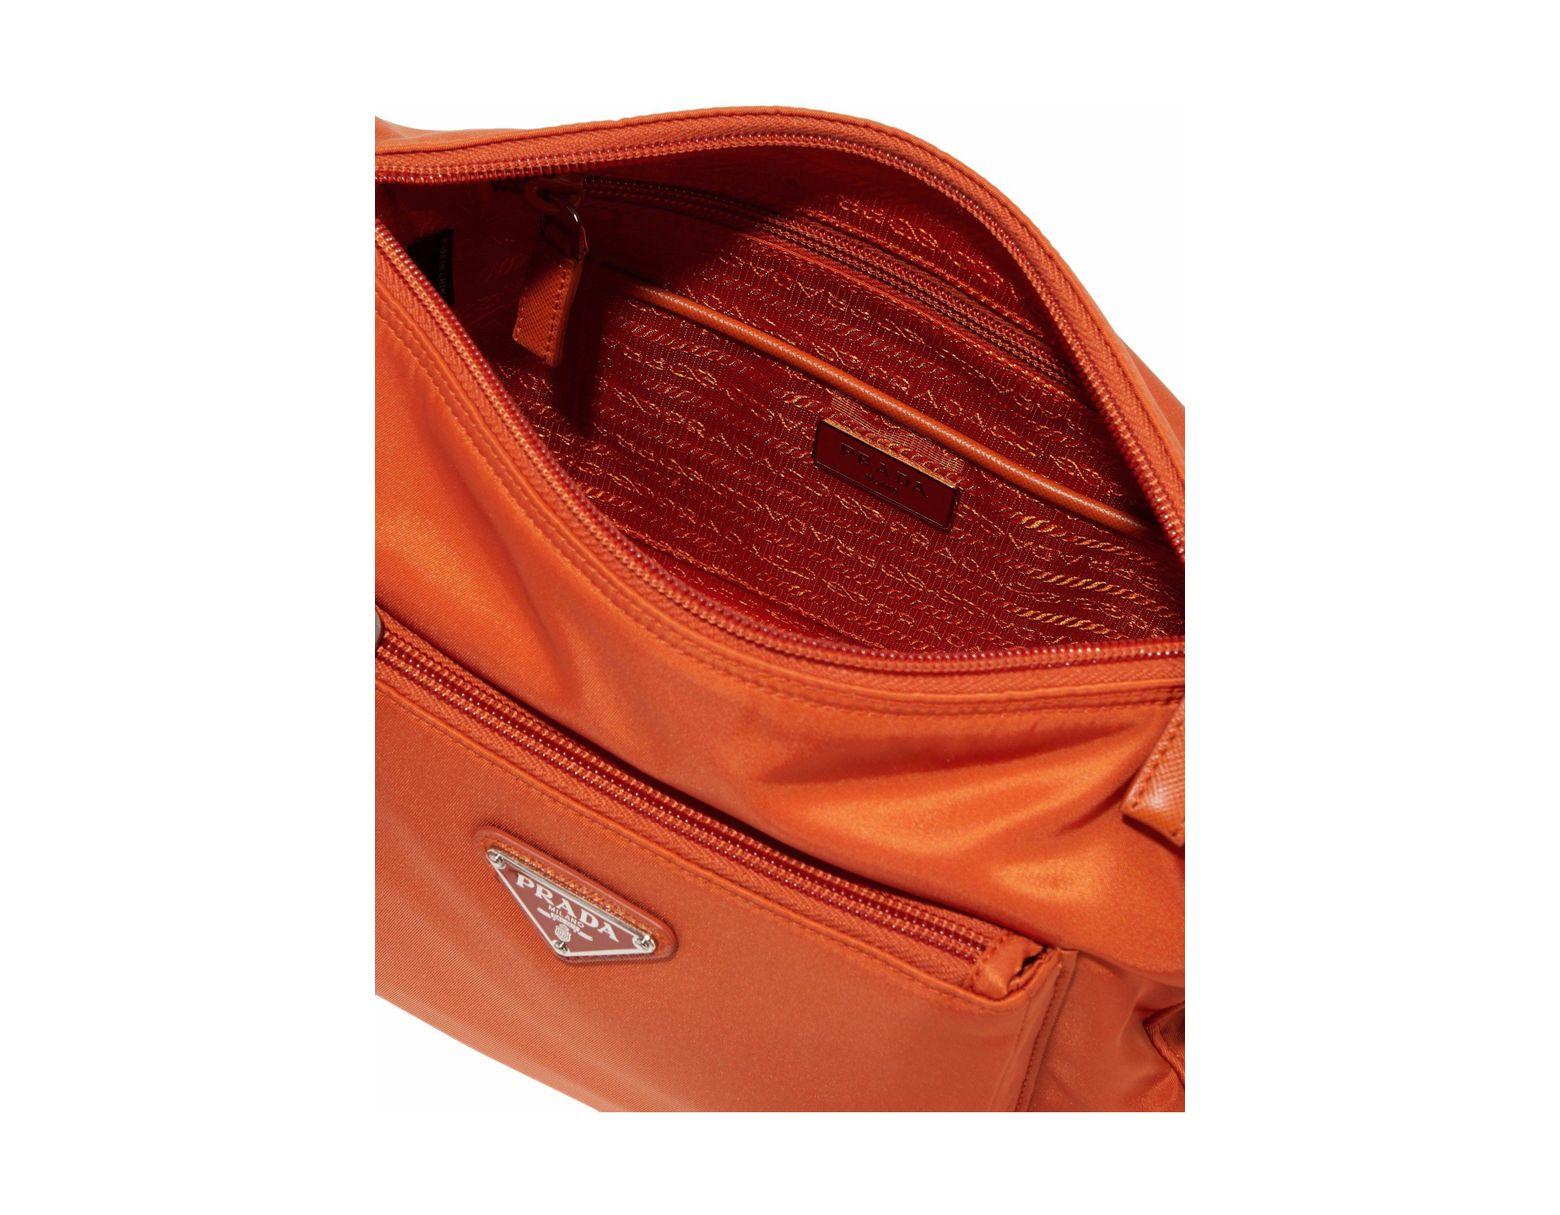 2dab9aab09921e Prada Woman Leather-trimmed Shell Shoulder Bag Orange in Orange - Lyst